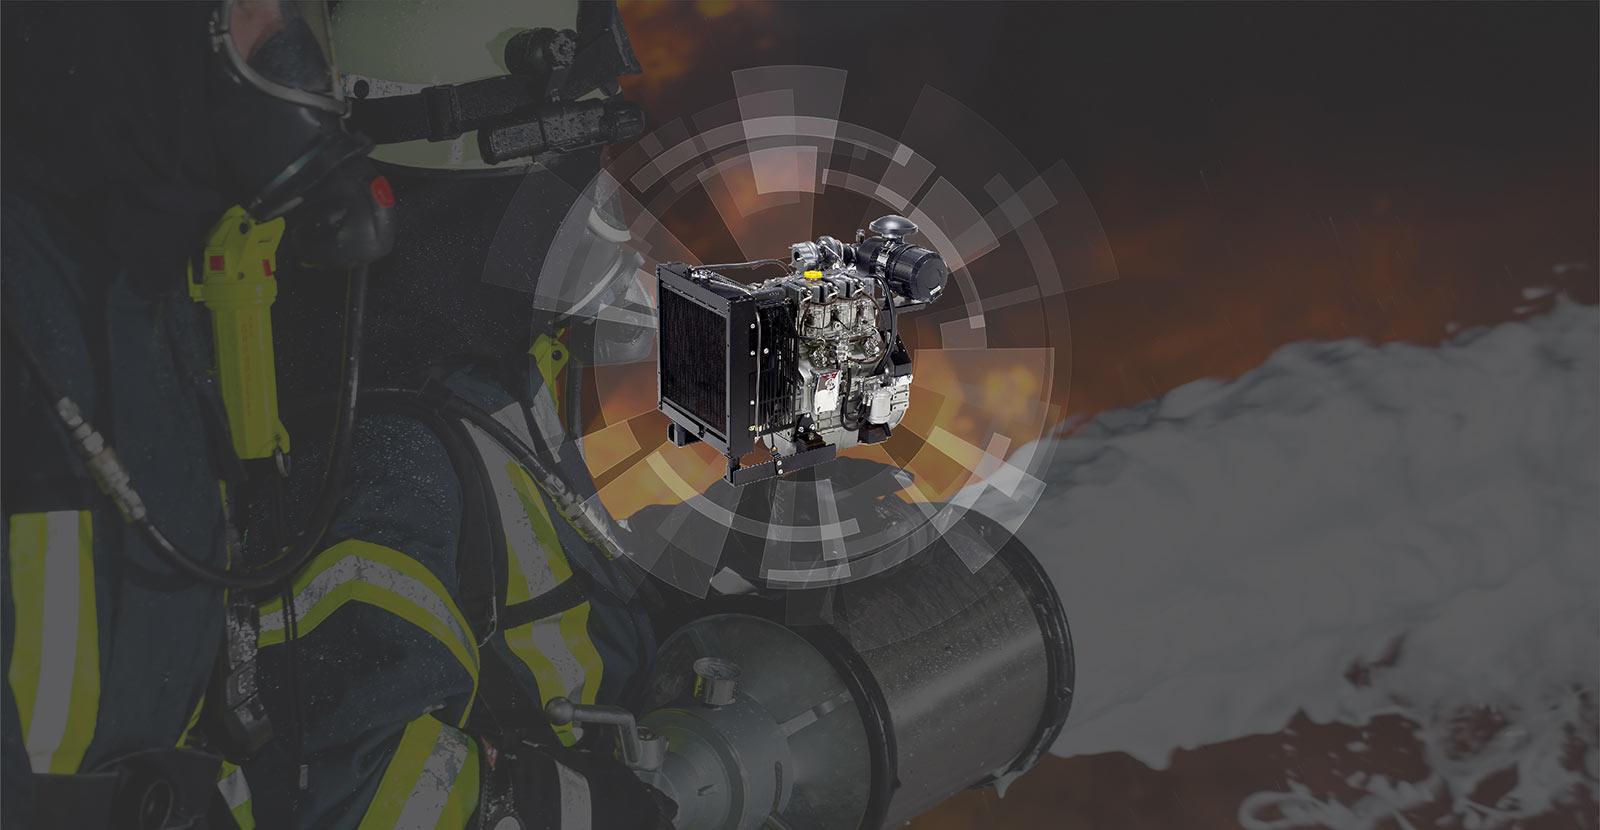 HIGH PERFORMANCE DIESEL ENGINES